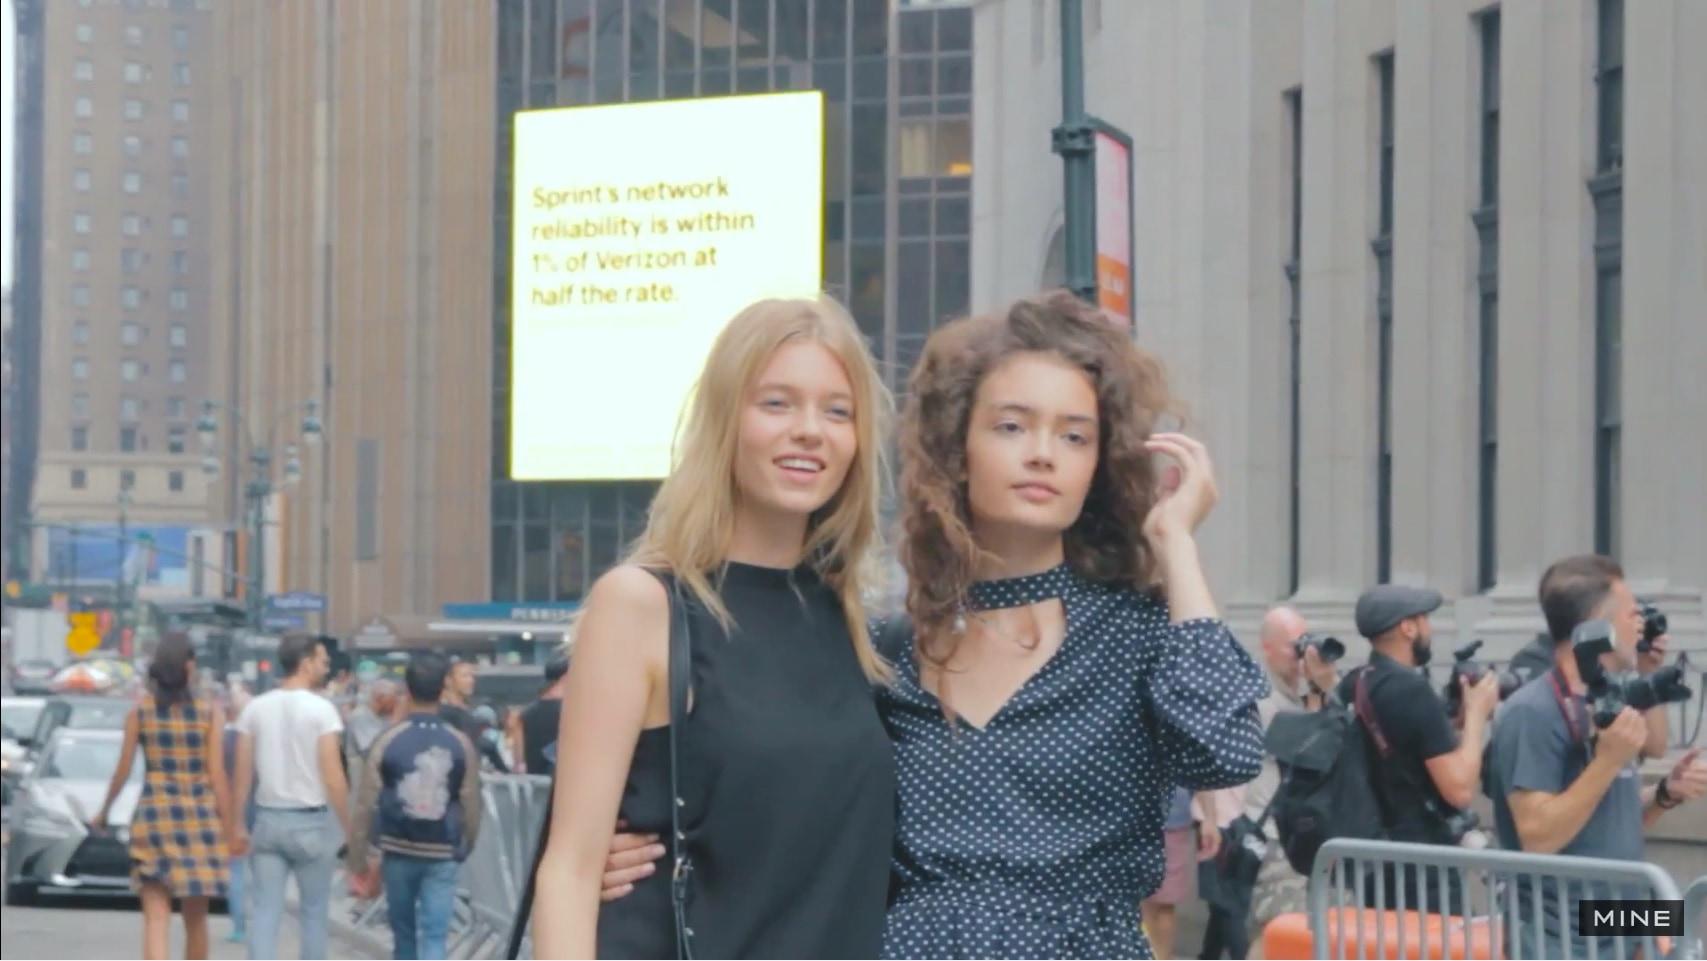 【New York Fashion Week】Skylightで行われたJonathan Simkhaiのファッションショー前でパパラッチ